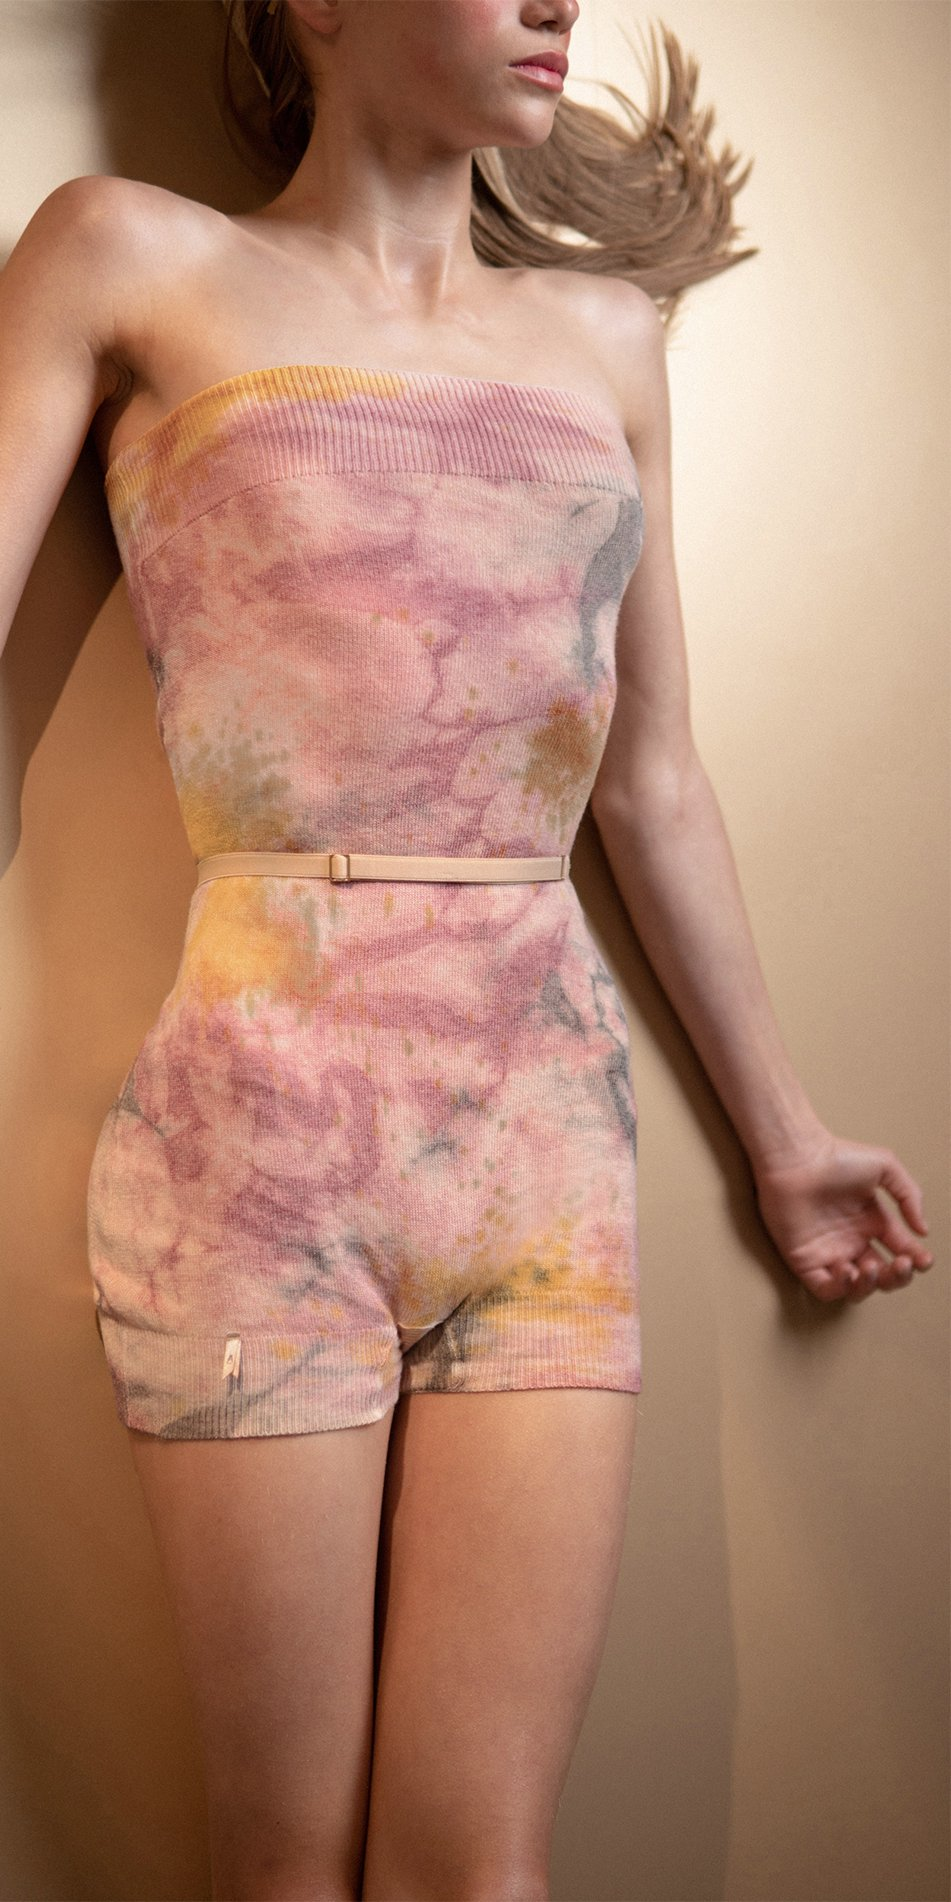 TIETIE DYE KNIWEAR shorts burgundy 14